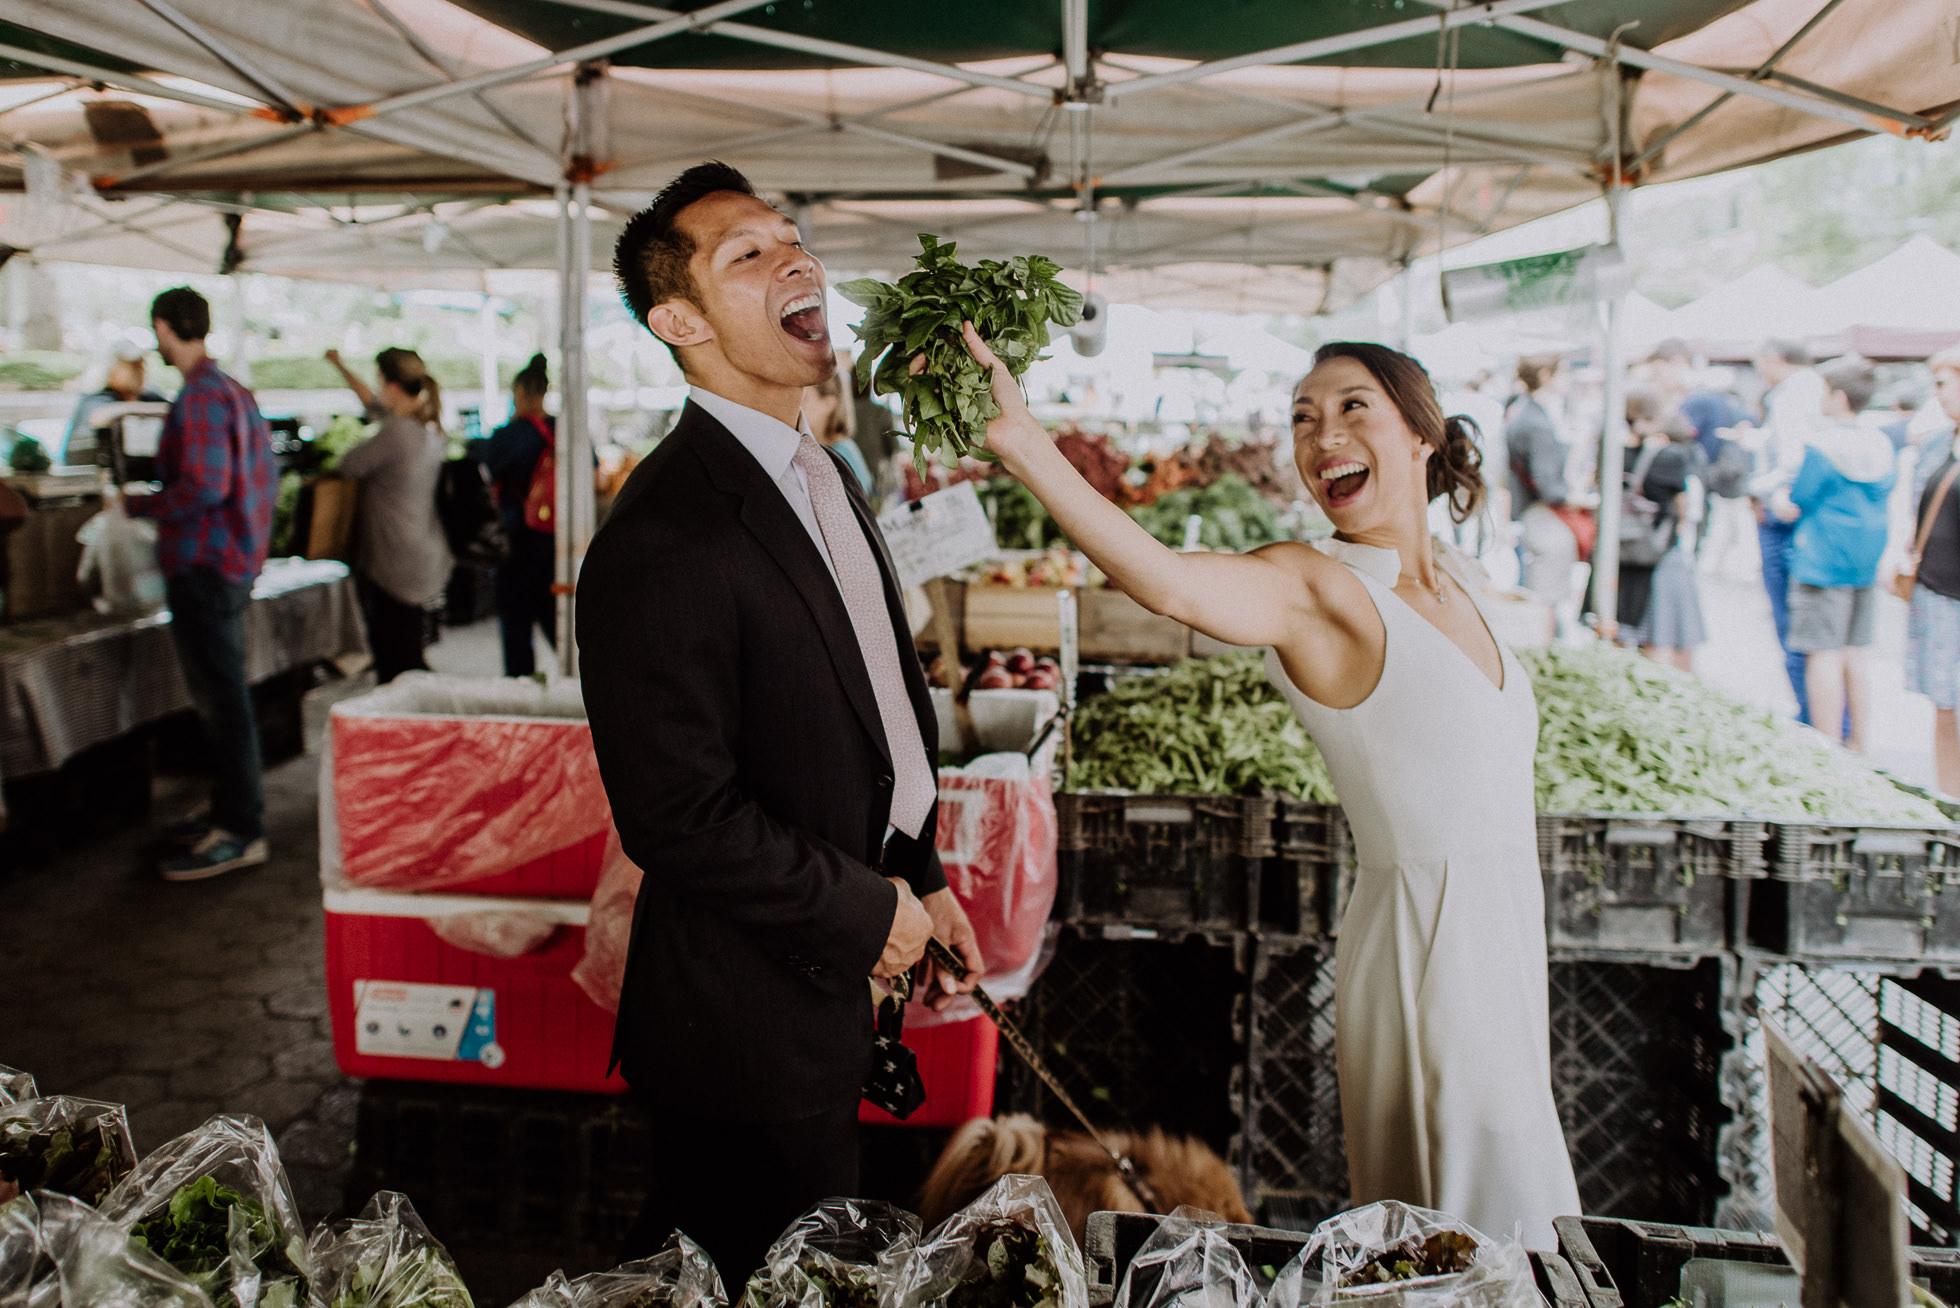 NYC greenmarket engagement photos